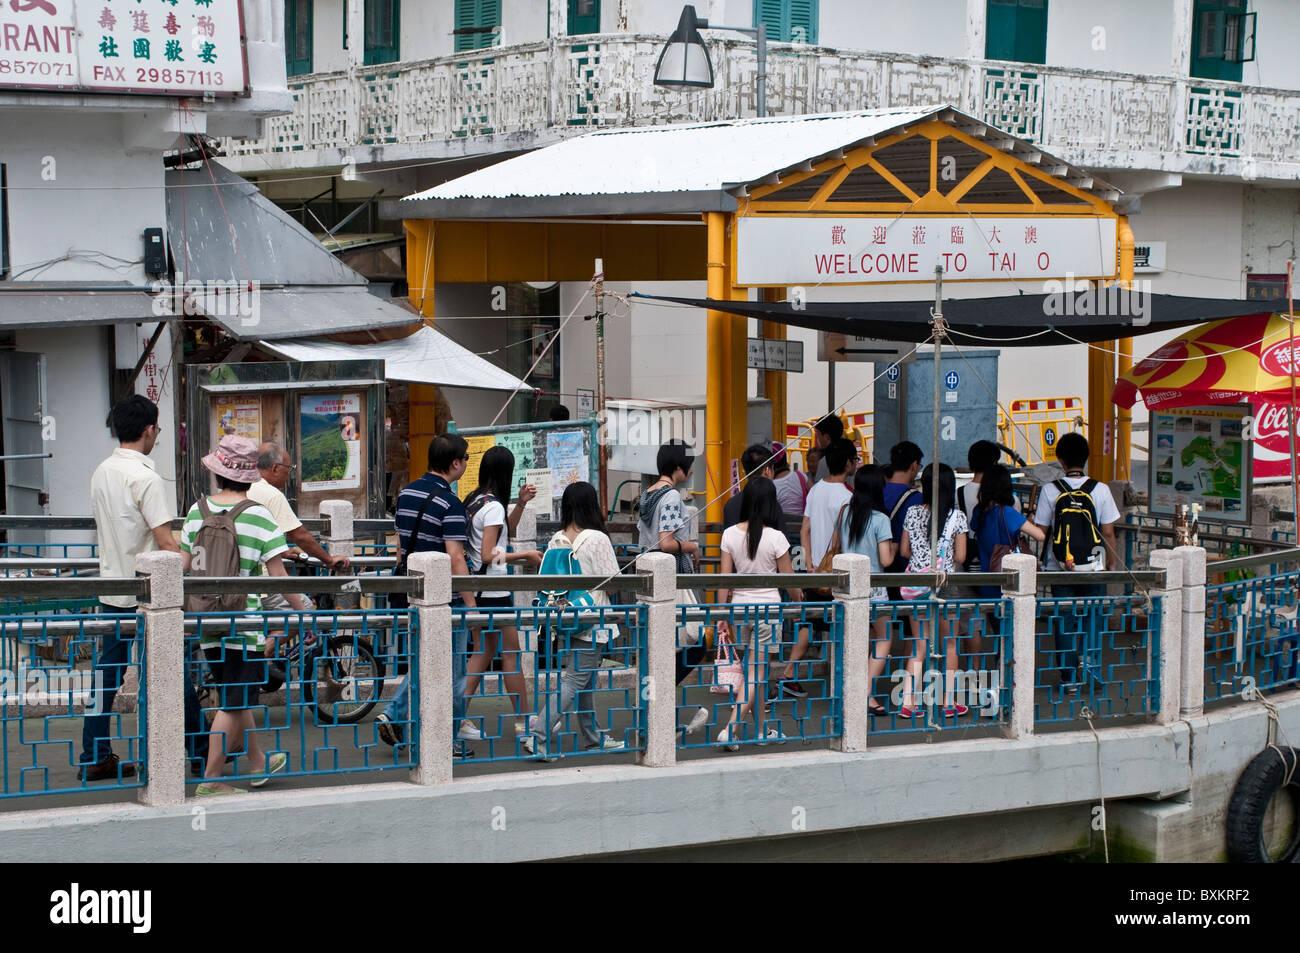 Tourists crossing the Bridge in Tai O village, Lantau island, Hong Kong, China - Stock Image